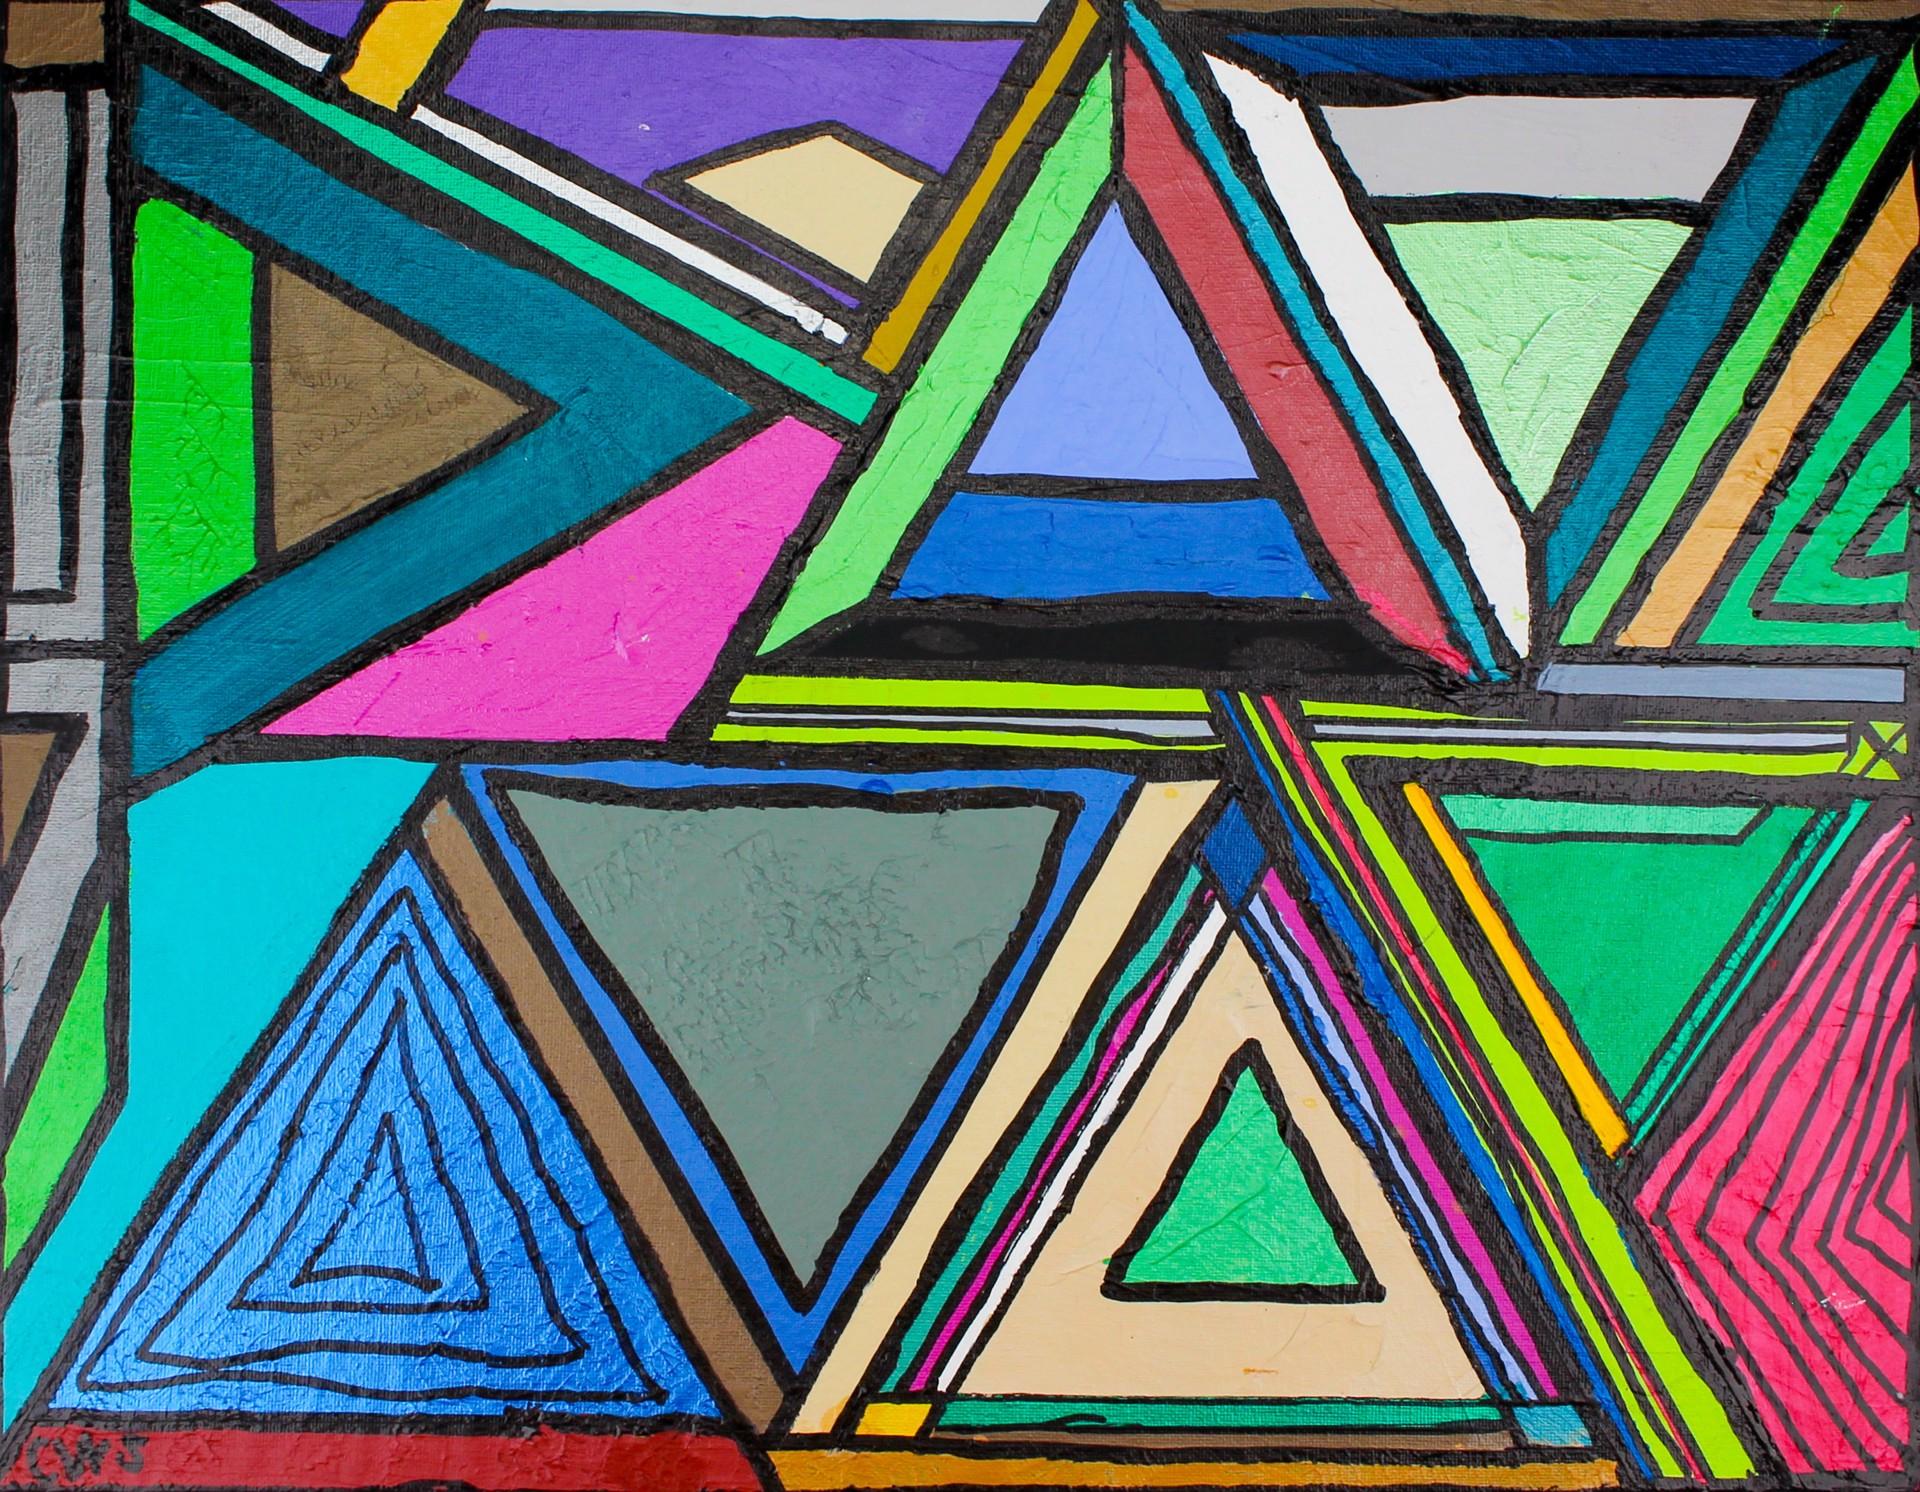 Triangle Color by Chris Schallhorn